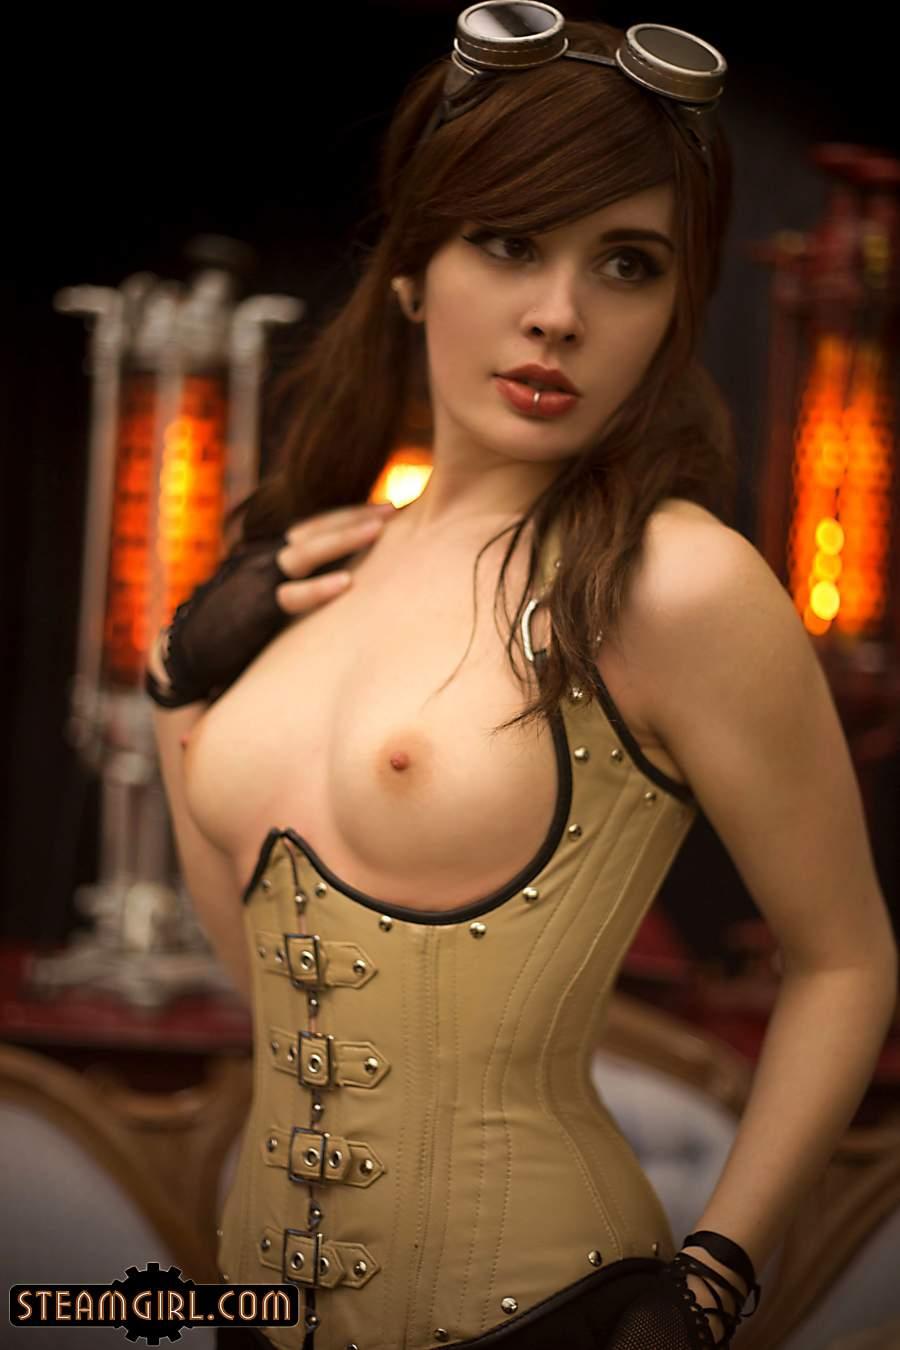 Steamgirl Nudes Nude photo 4